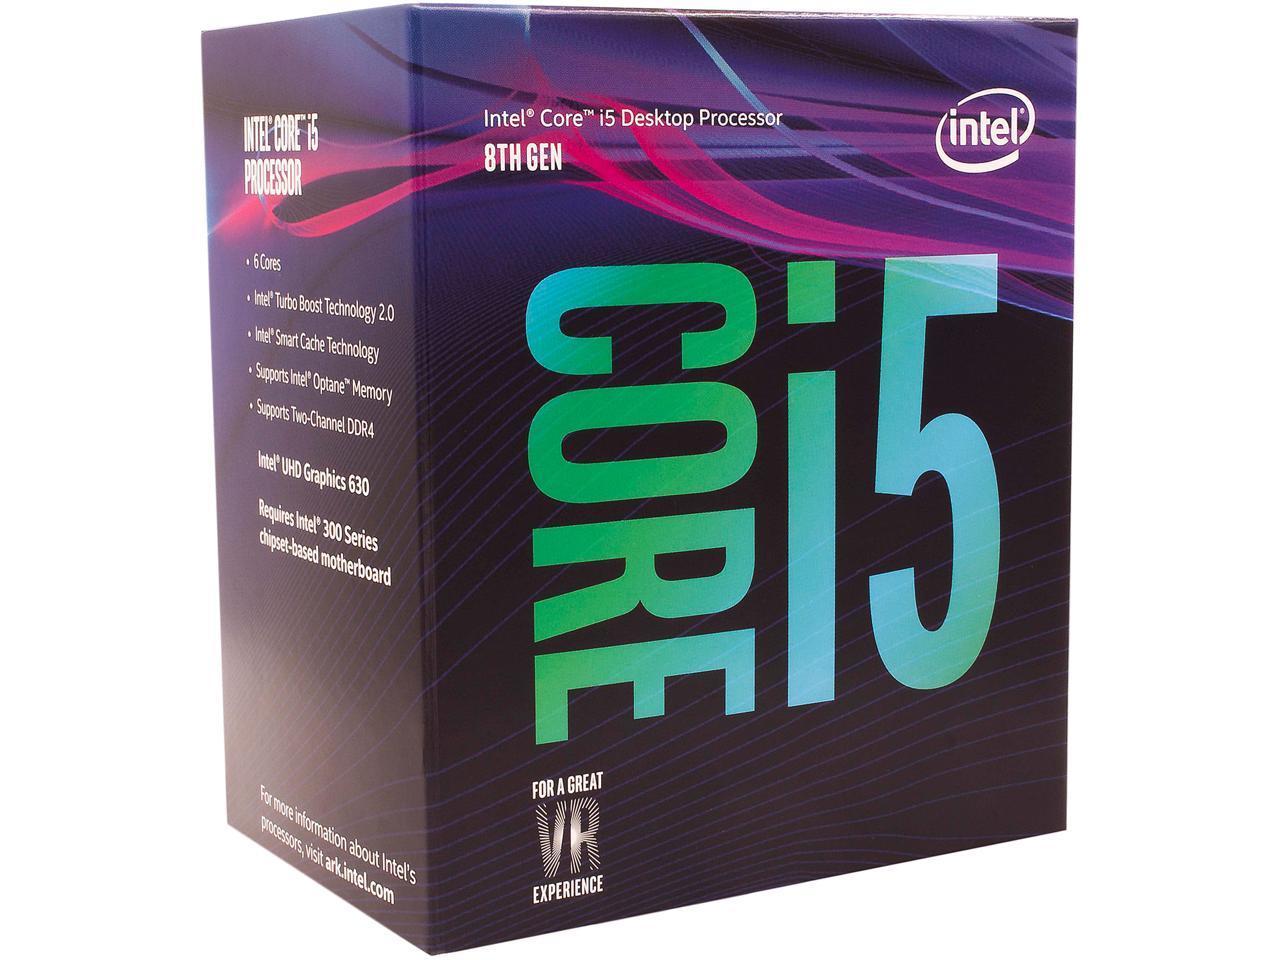 19ea4aa660 Procesador para computadora de escritorio Intel Core i5-8500 Coffee Lake  6-Core 3.0